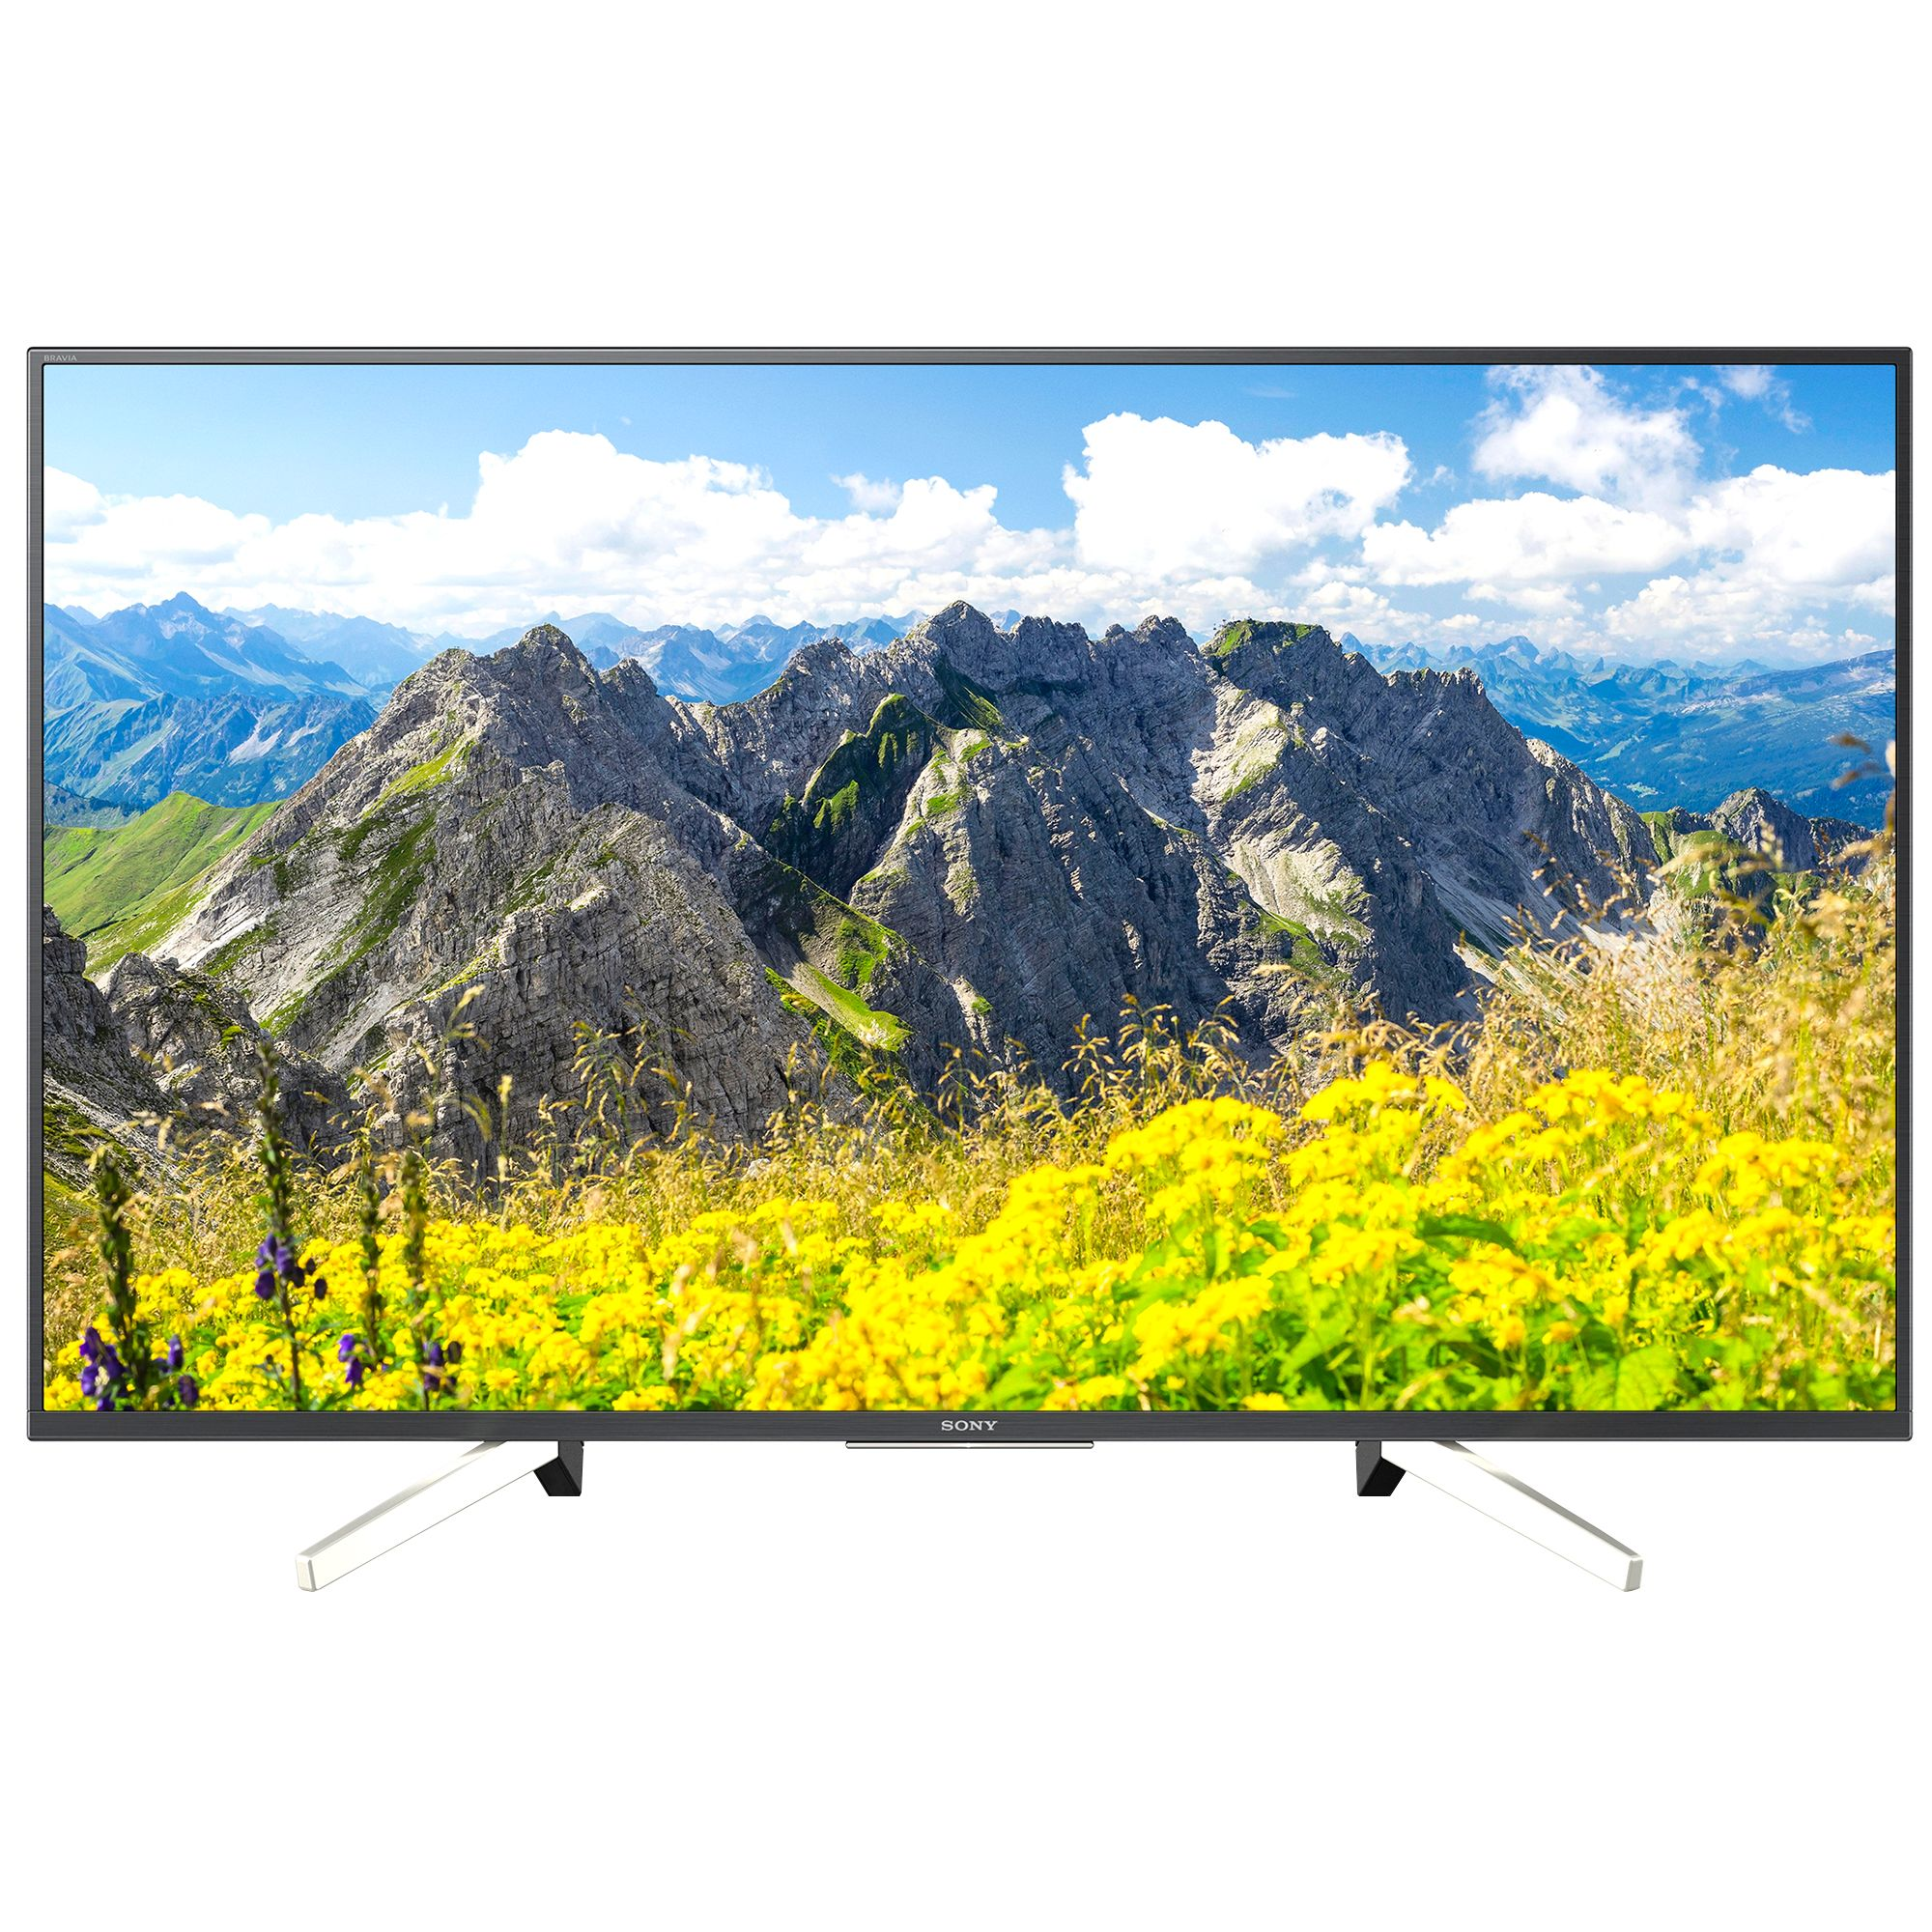 Televizor LED Sony Smart TV KD-43XF7596 108cm Android 4K Ultra HD Negru